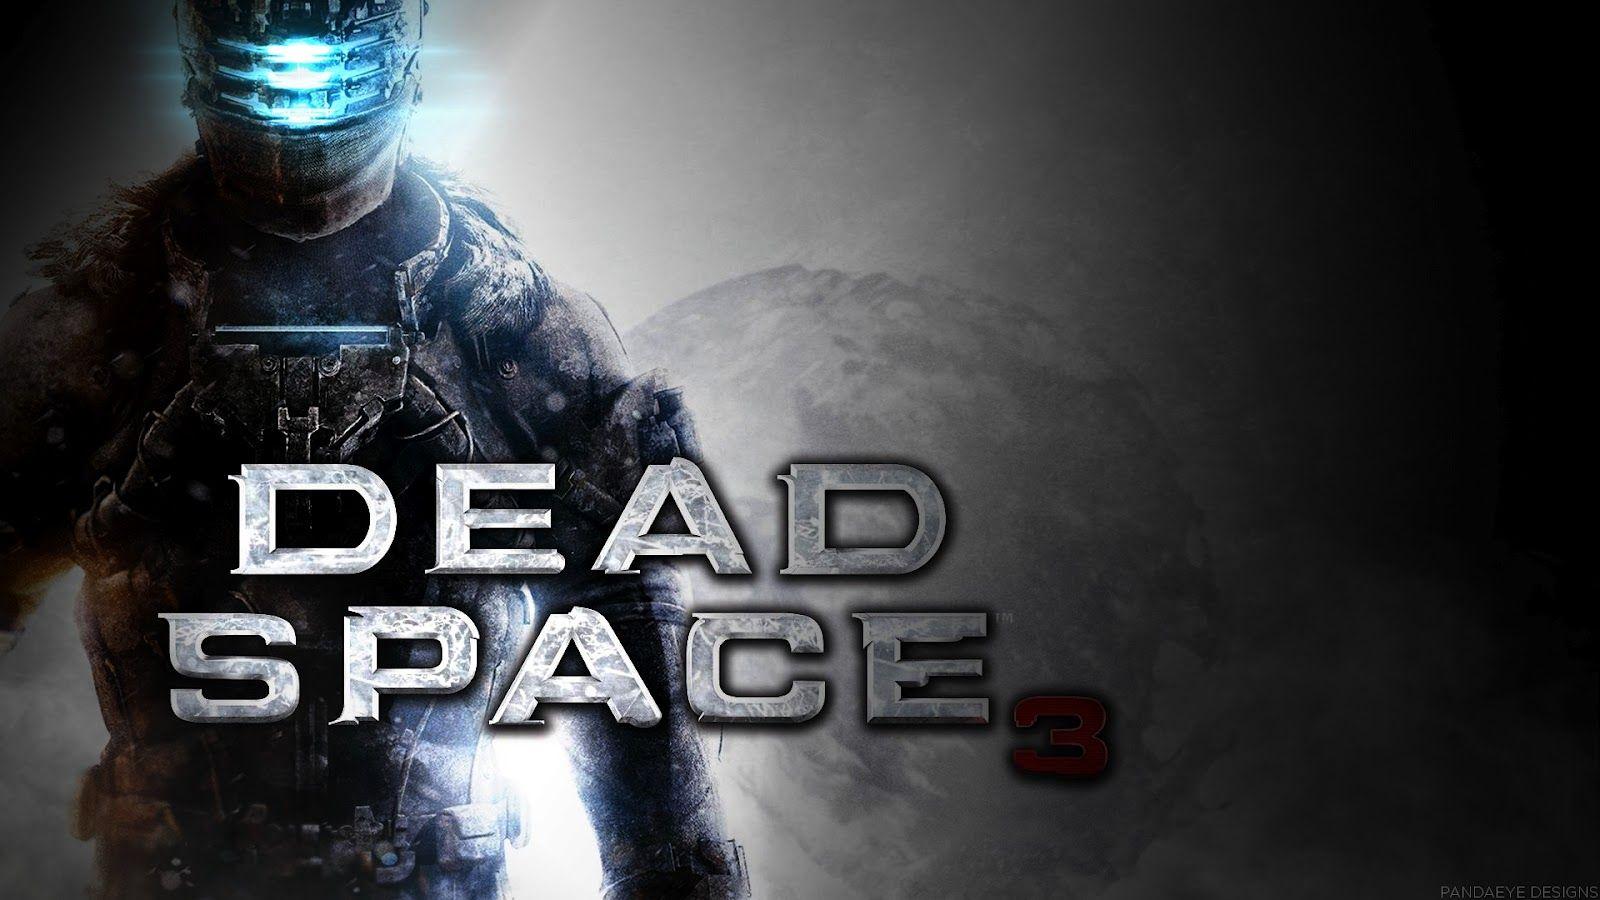 Dead space wallpapers hd wallpapersafari - Space wallpaper 1600x900 ...